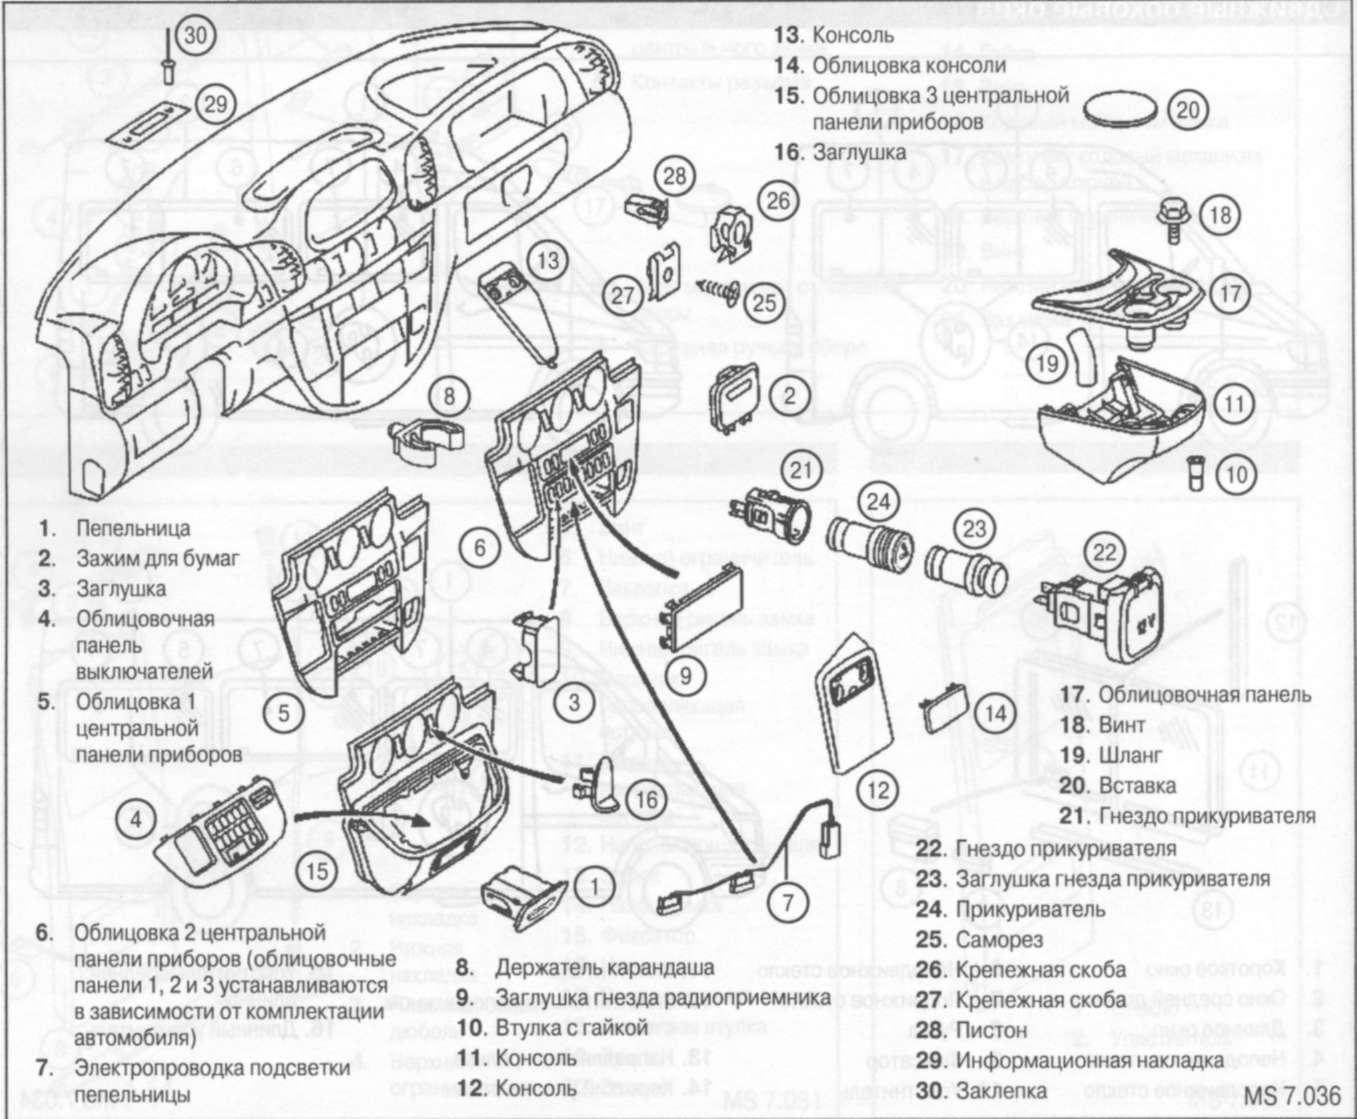 9.13.2 Схема крепления подушки безопасности переднего пассажира